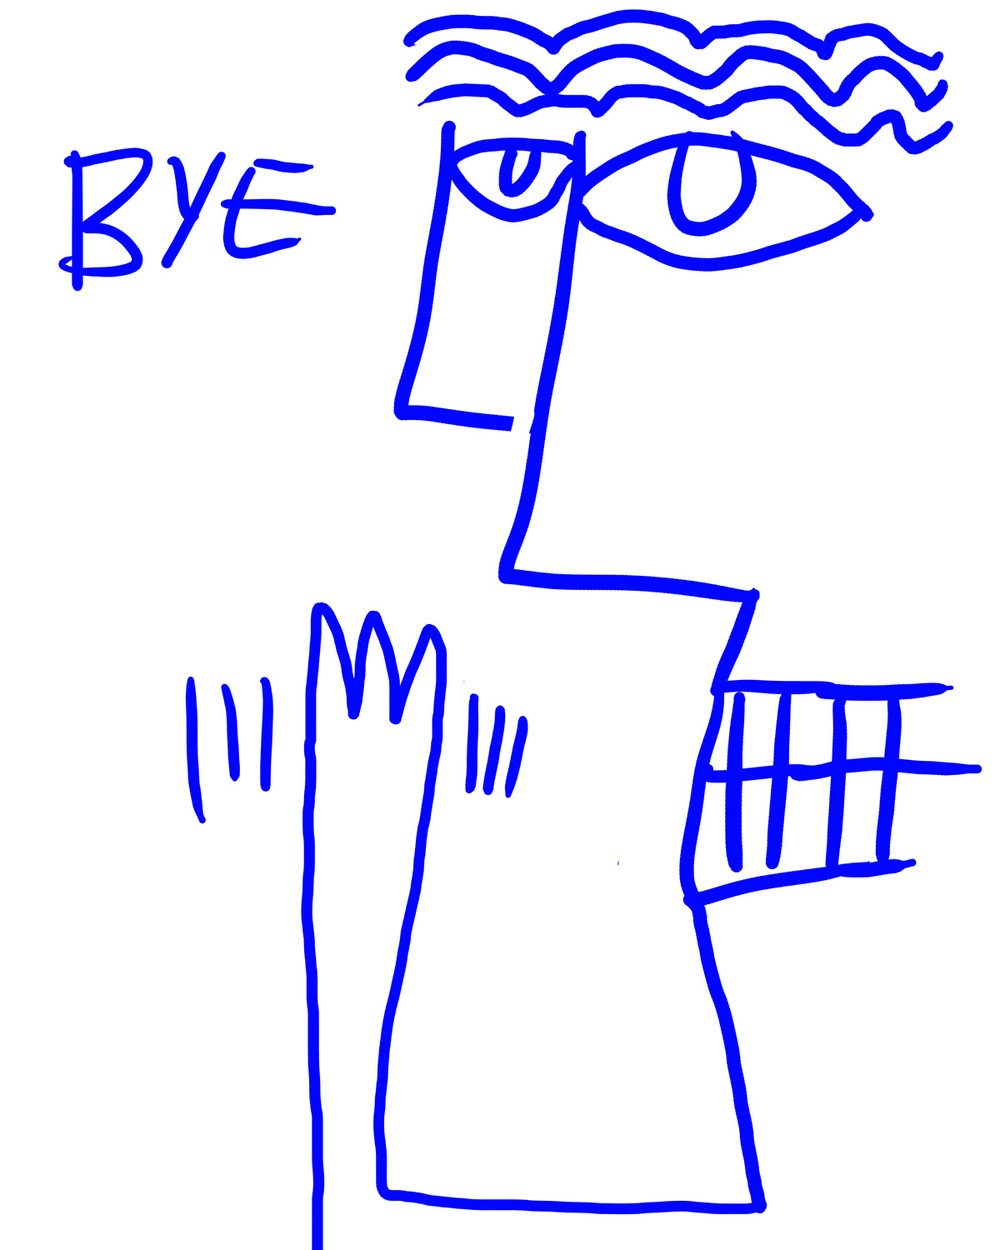 """bye!""portrait doodle by by Matt Vaillette"